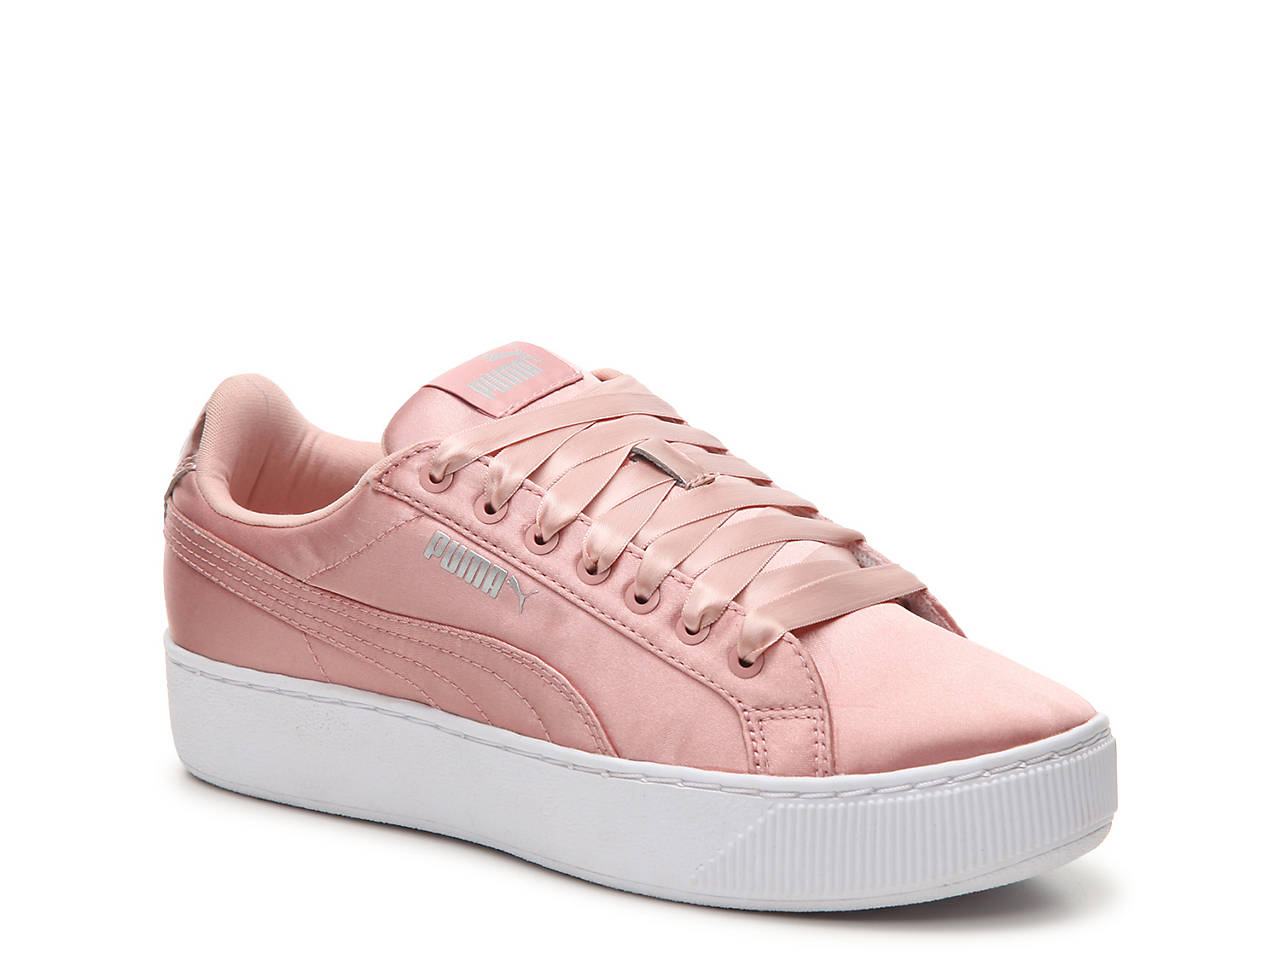 1178b172846 Puma Vikky Platform Sneaker - Women s Women s Shoes